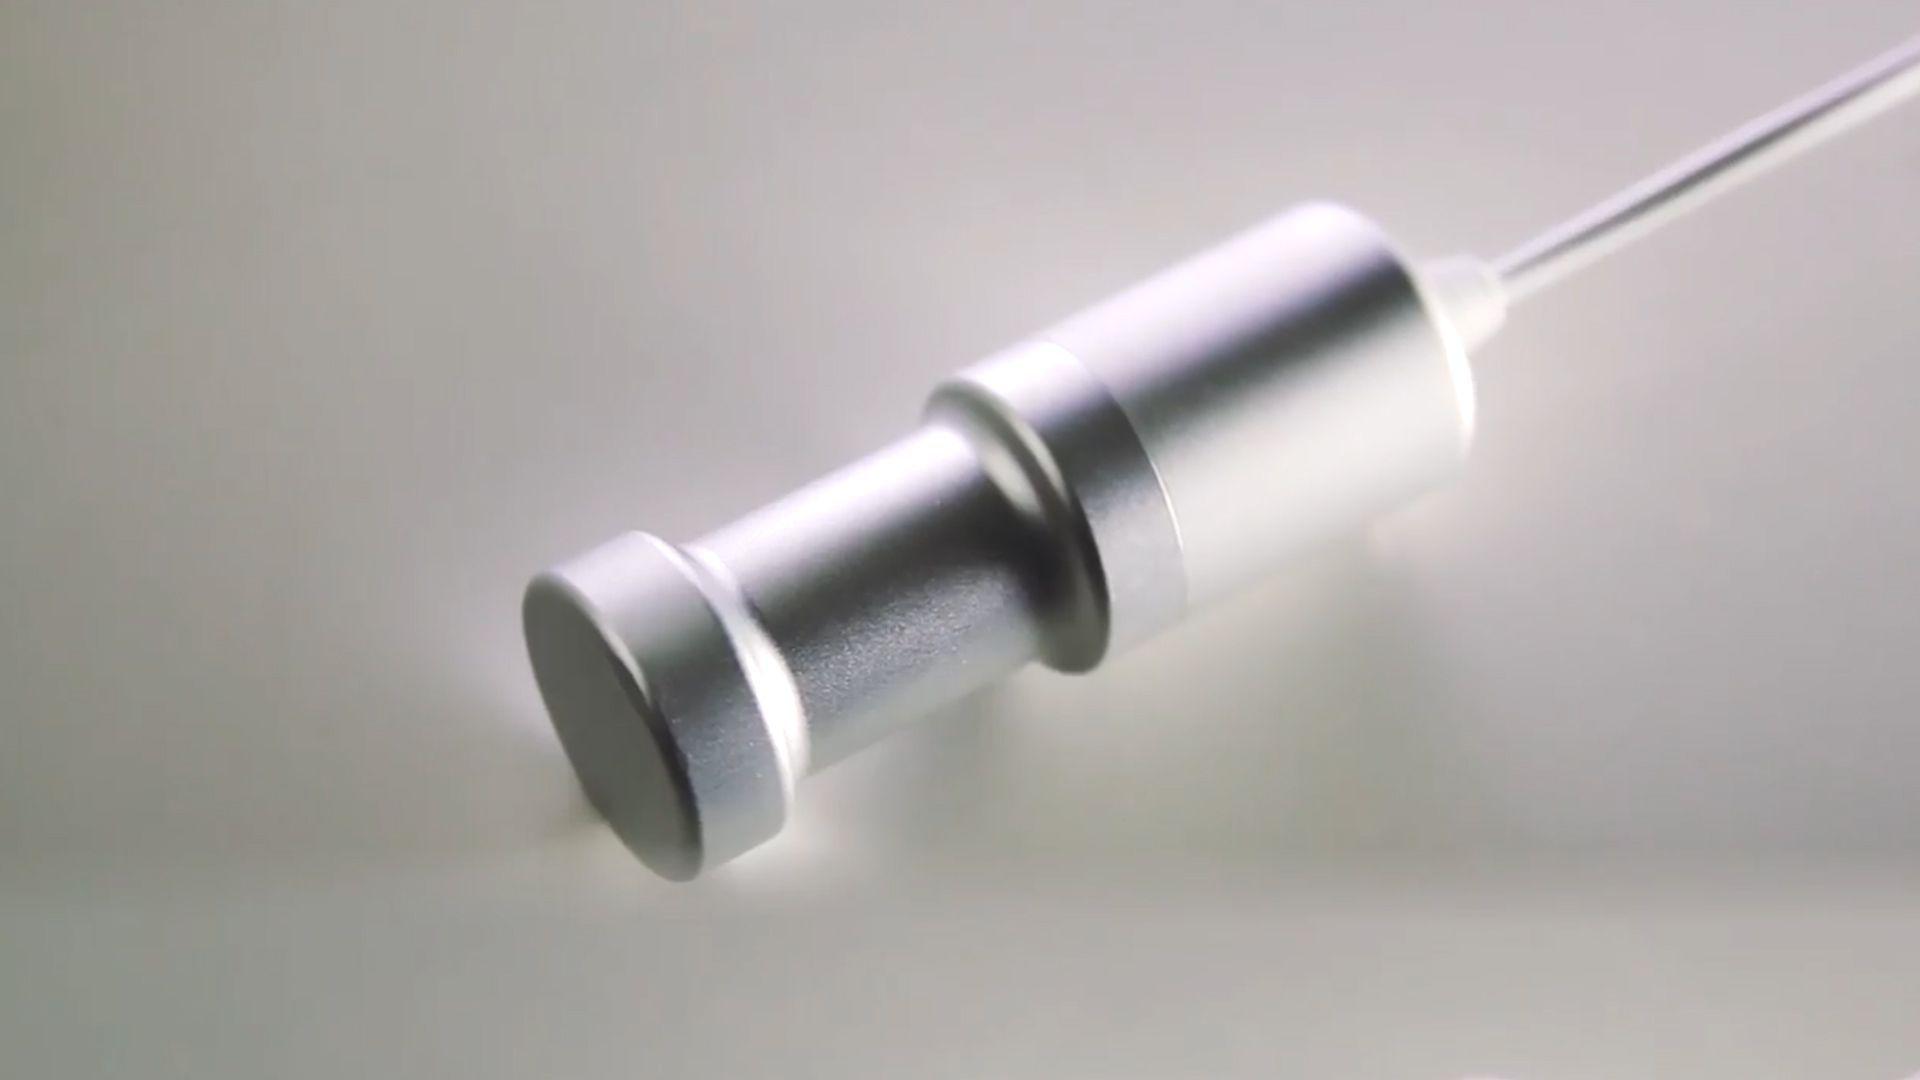 Https%3a%2f%2fblueprint api production.s3.amazonaws.com%2fuploads%2fvideo uploaders%2fdistribution thumb%2fimage%2f82844%2f69787eba 3650 4f5b b043 6f8ecaa2b791